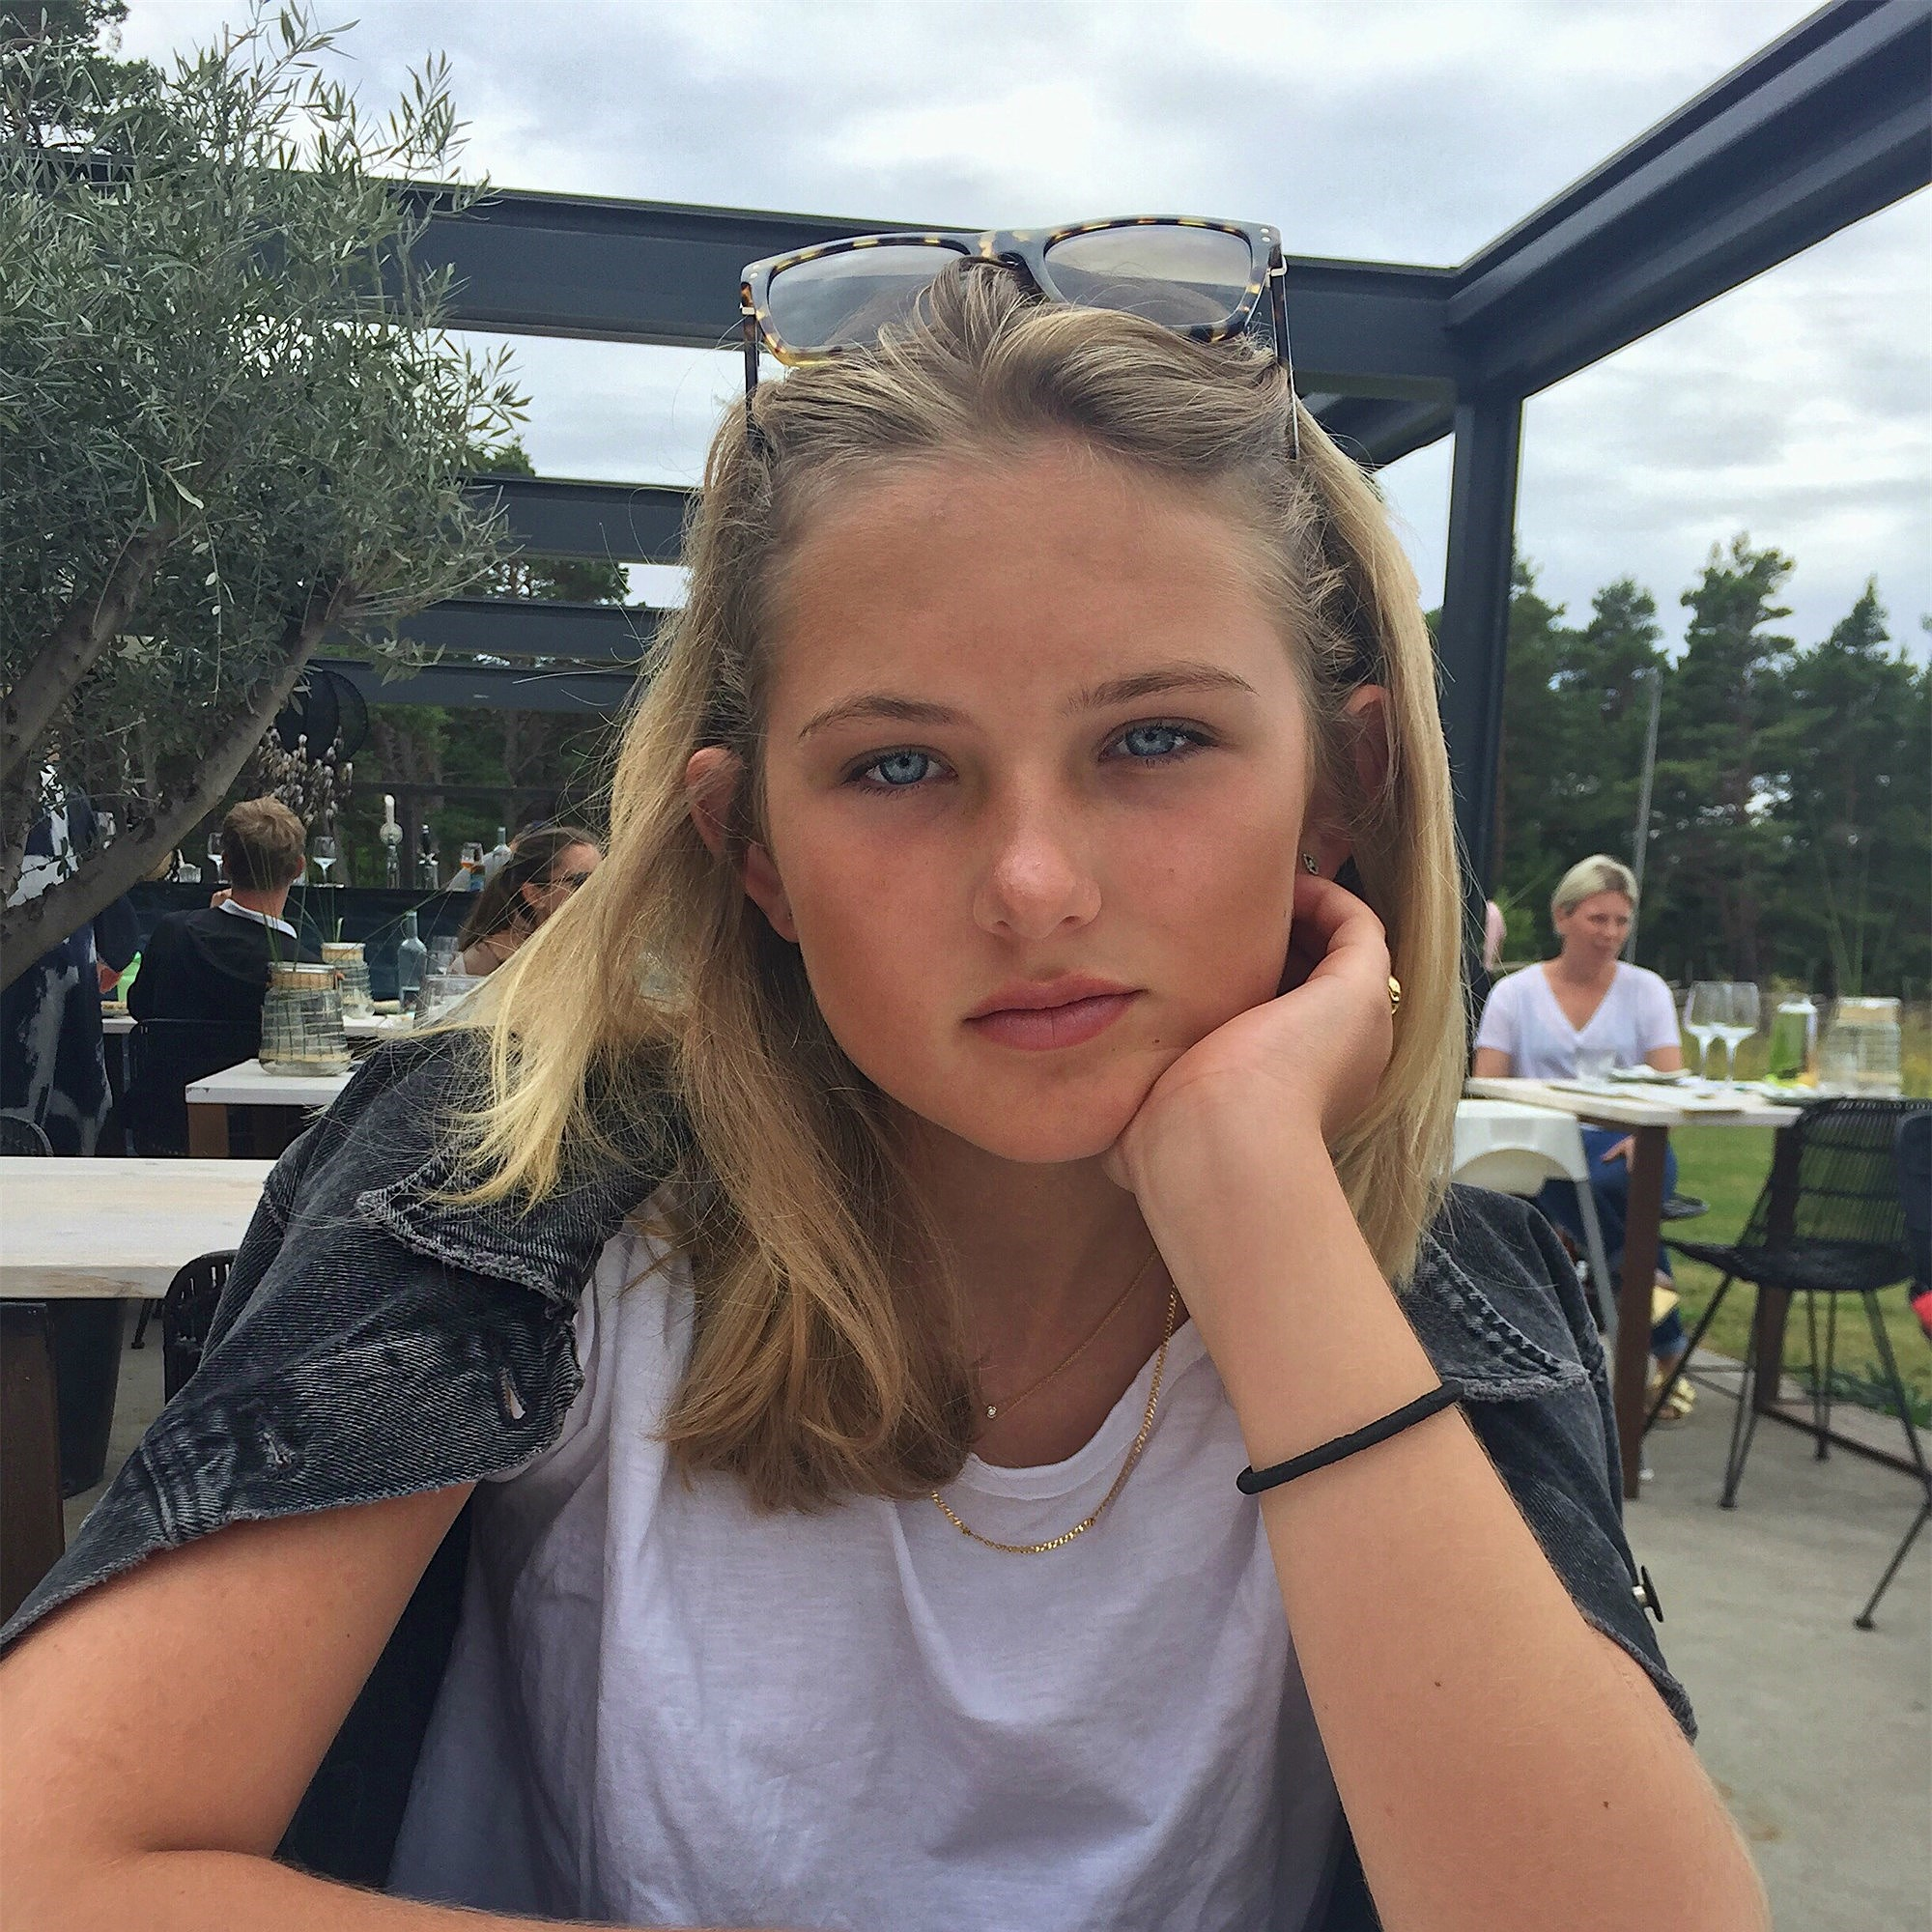 EmilyStrihagen